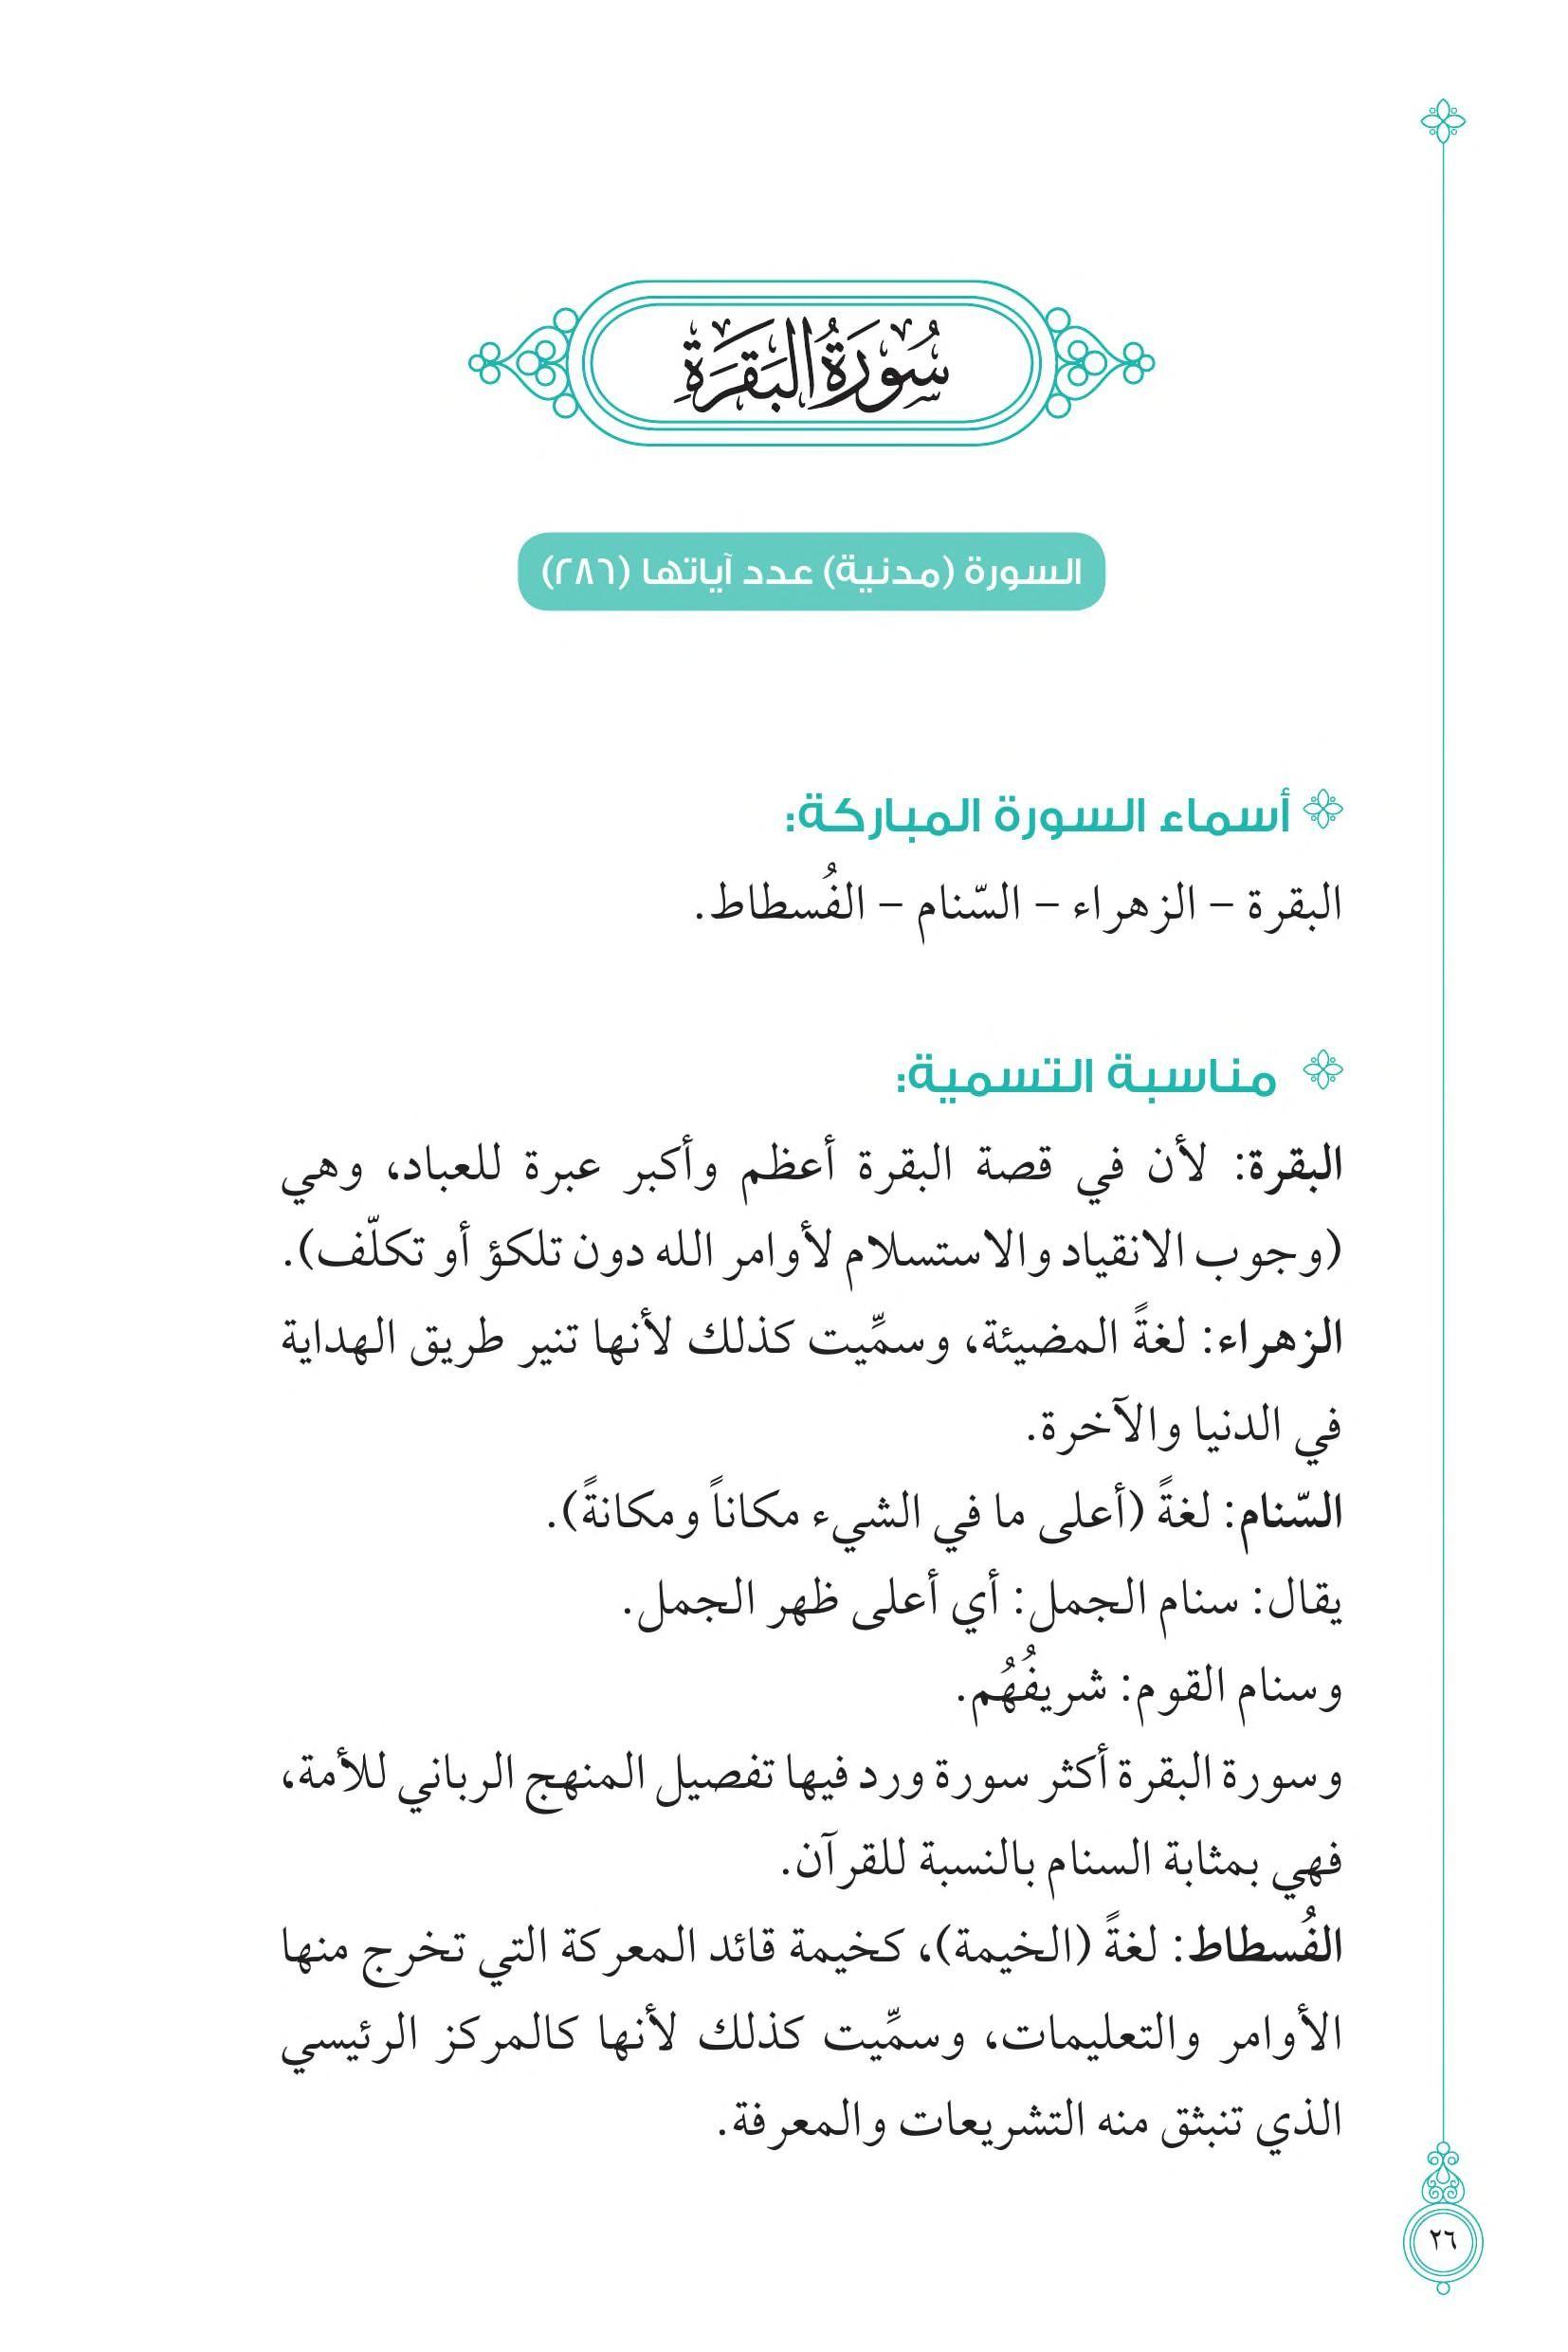 كتاب أول مرة أتدبر القرآن Free Download Borrow And Streaming Internet Archive Pdf Books Reading Quran Quotes Inspirational Book Recommendations